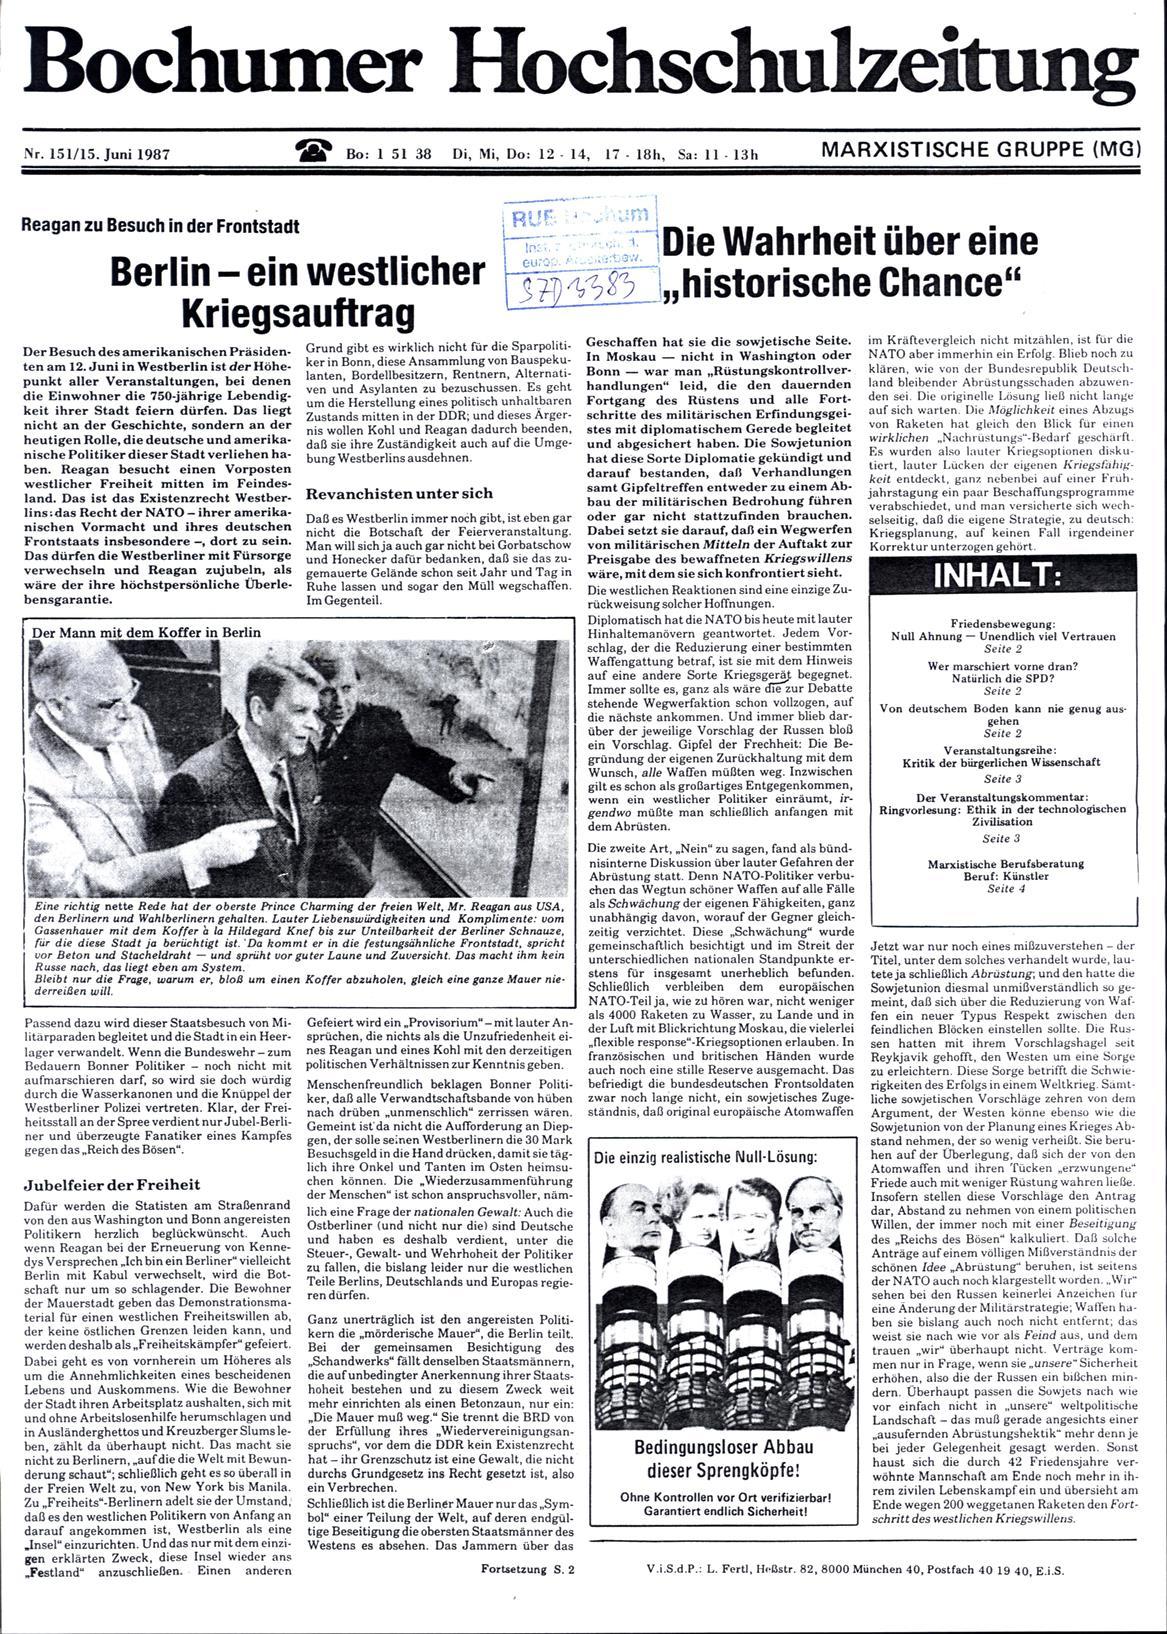 Bochum_BHZ_19870615_151_001